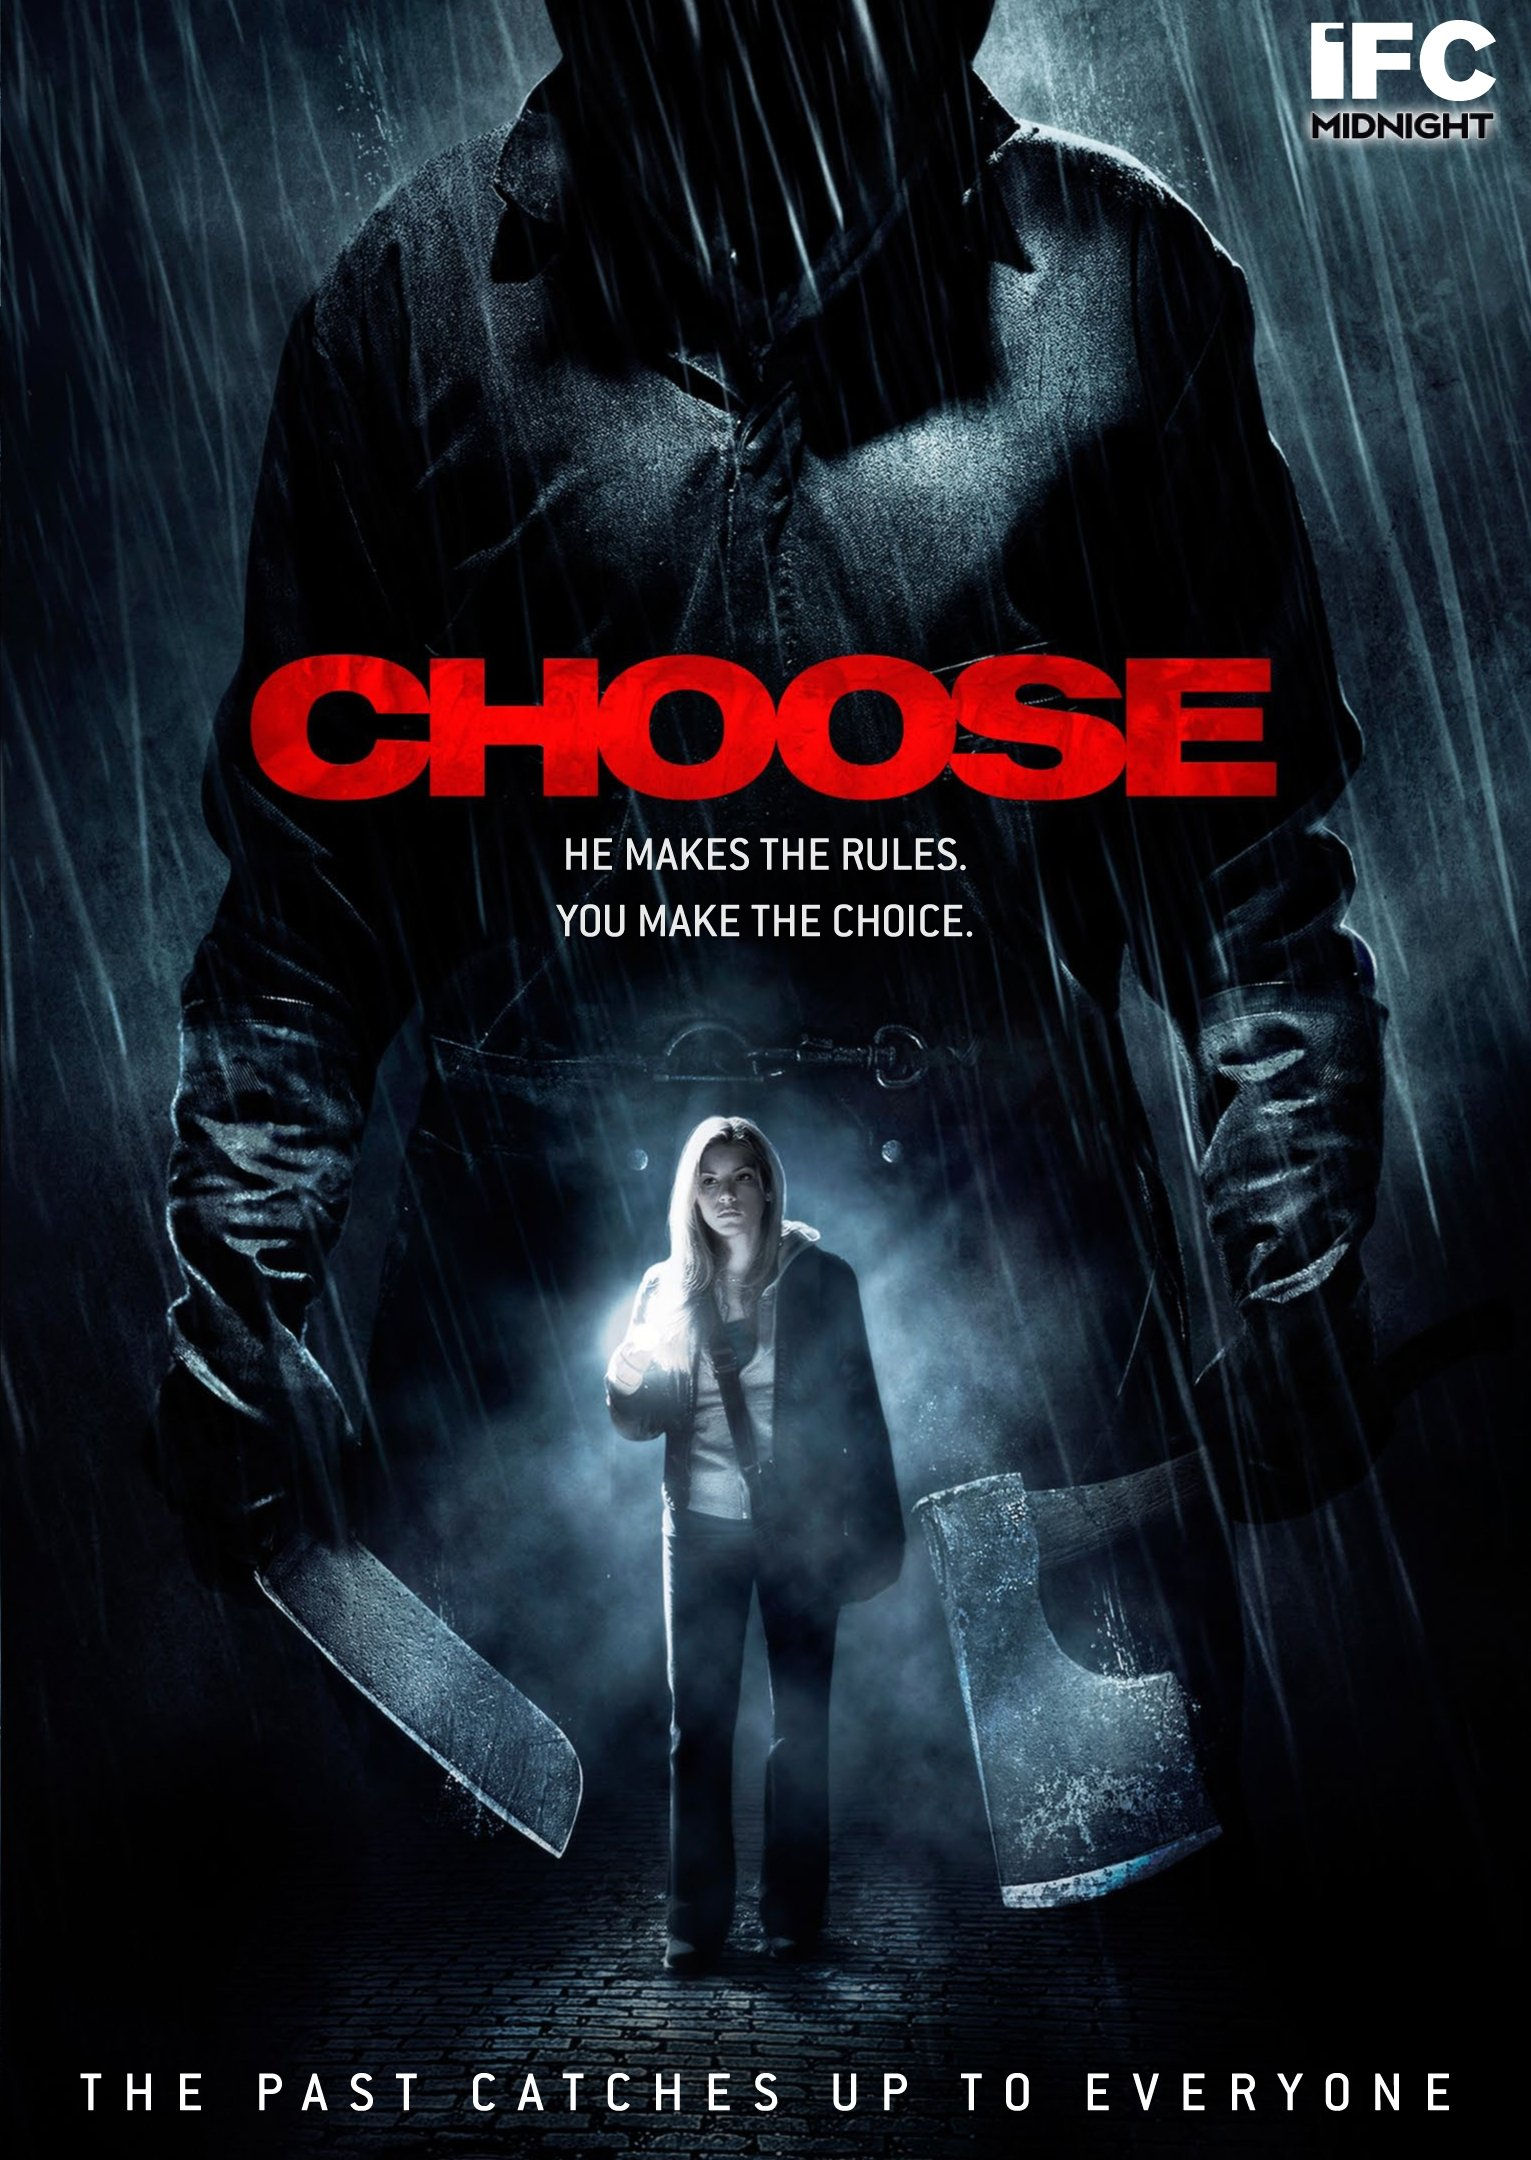 Choose DVD Release Date August 9 2011